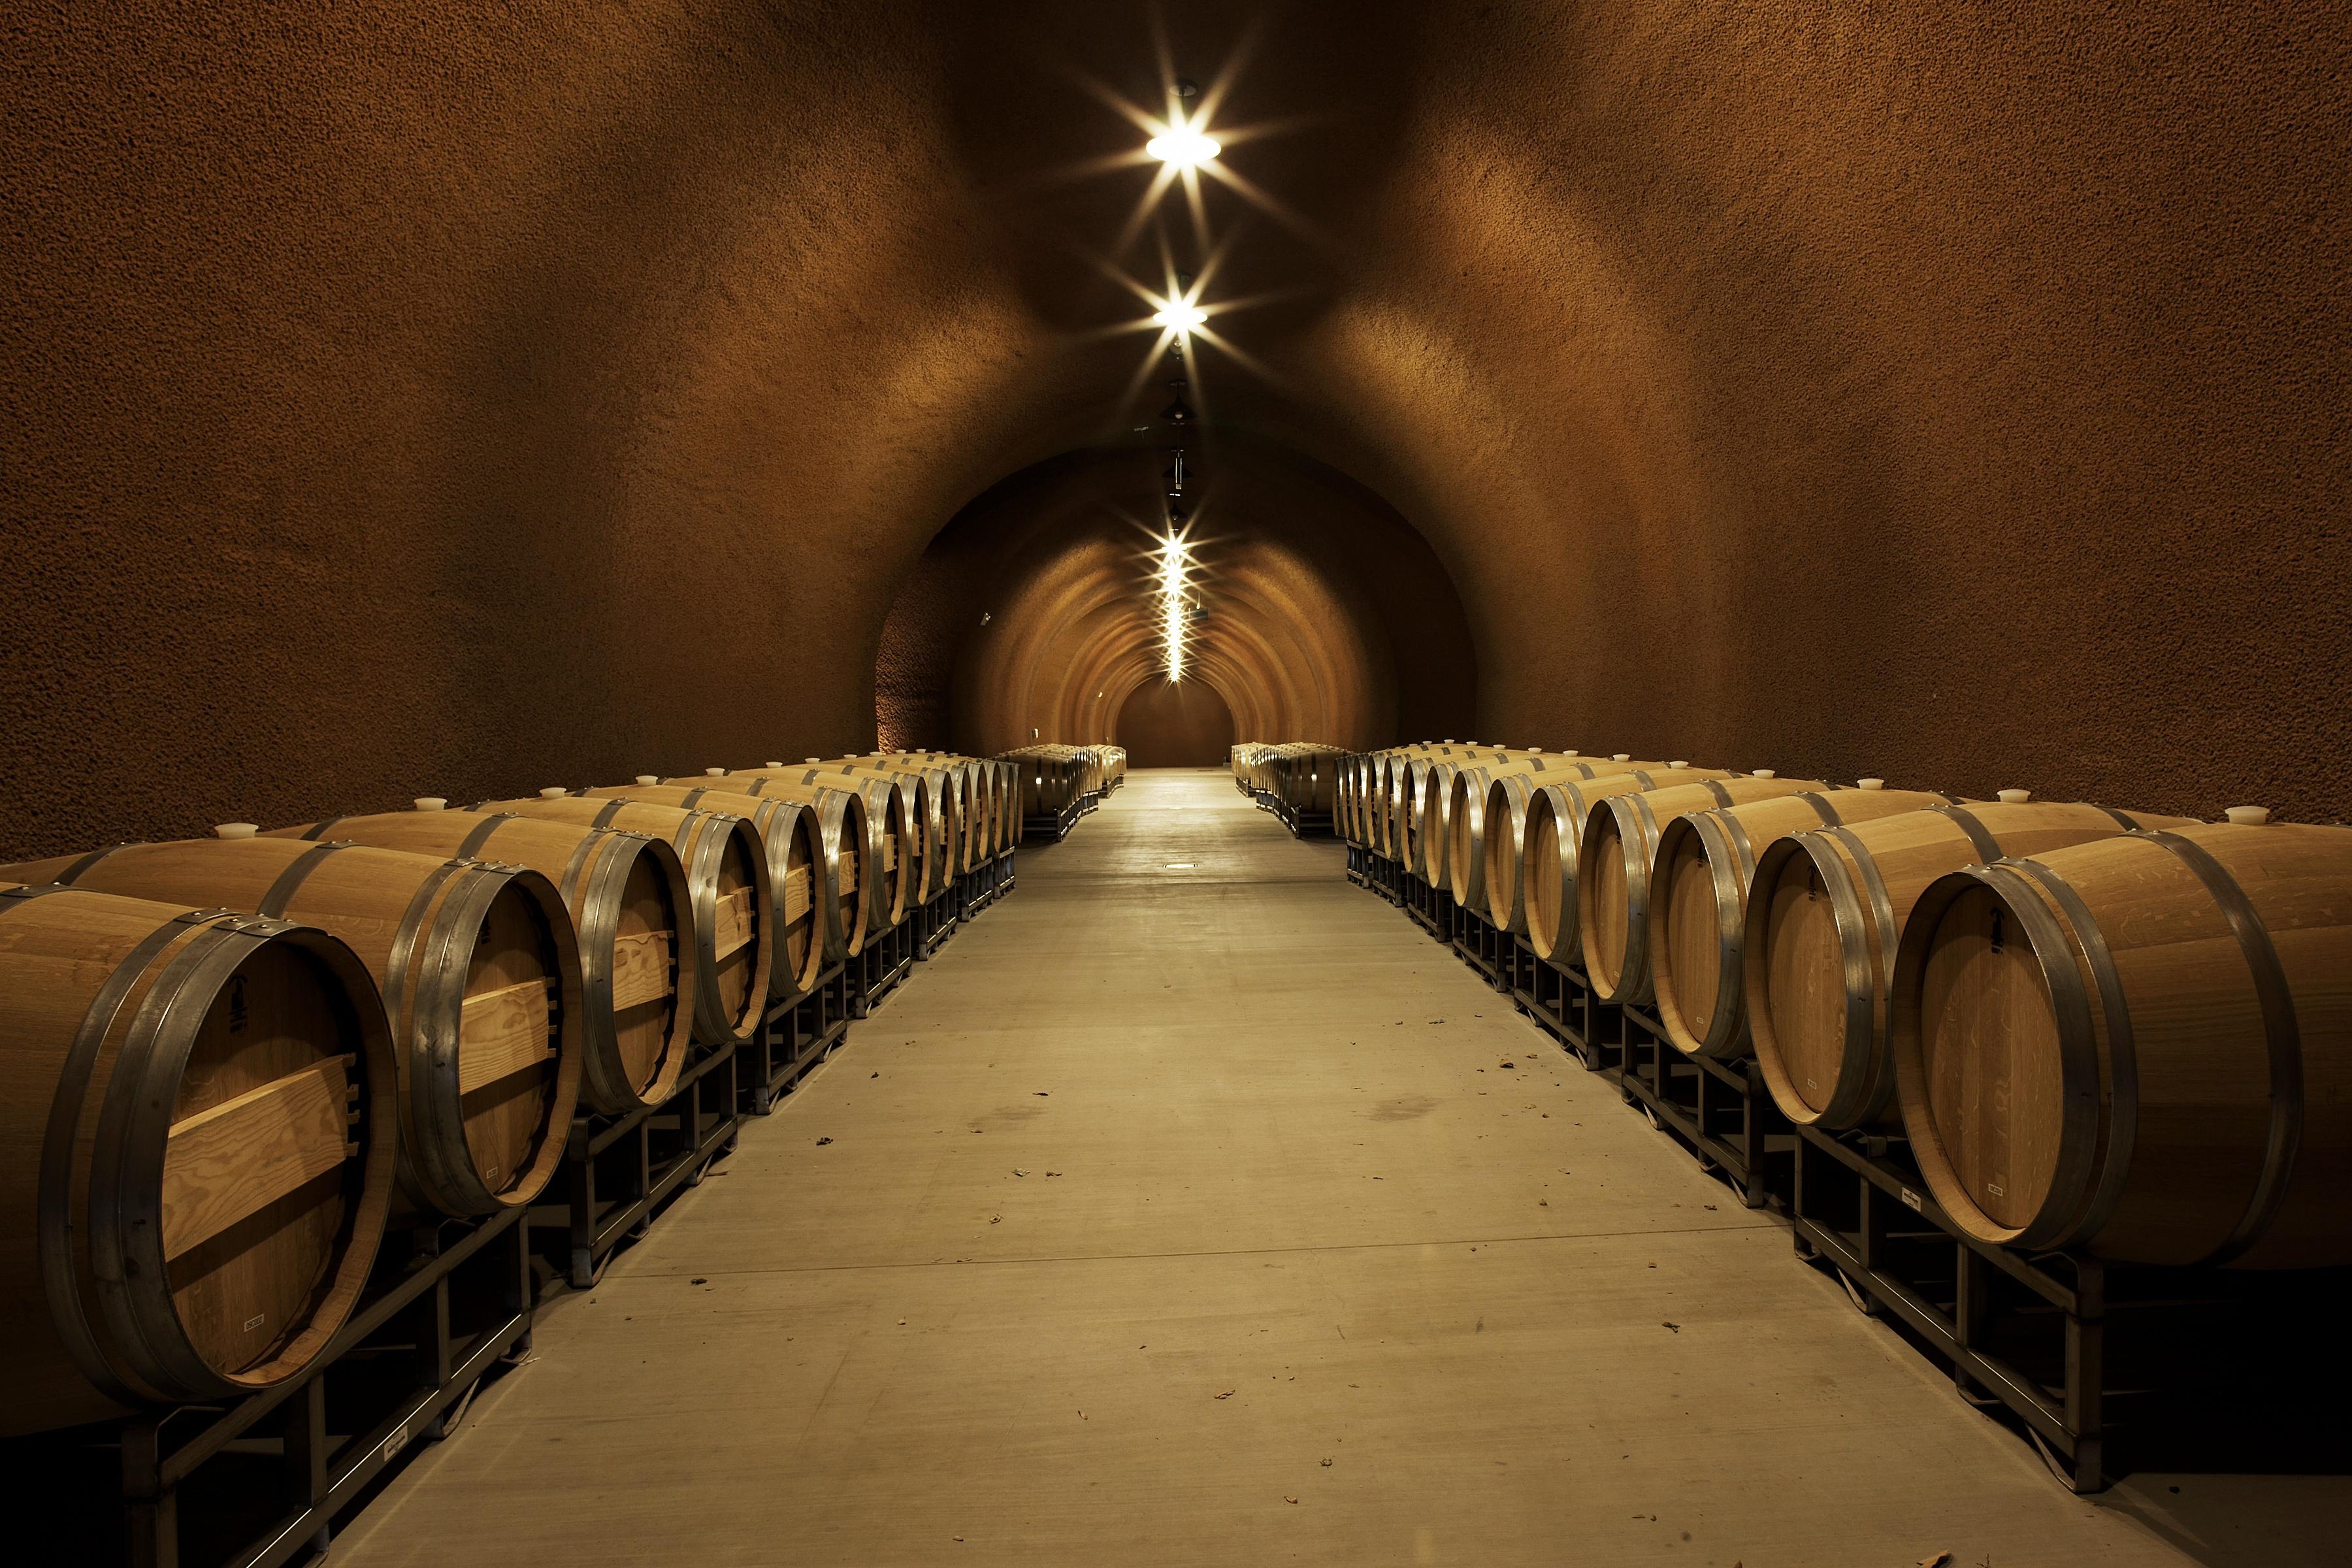 Kenzo Estate Winery